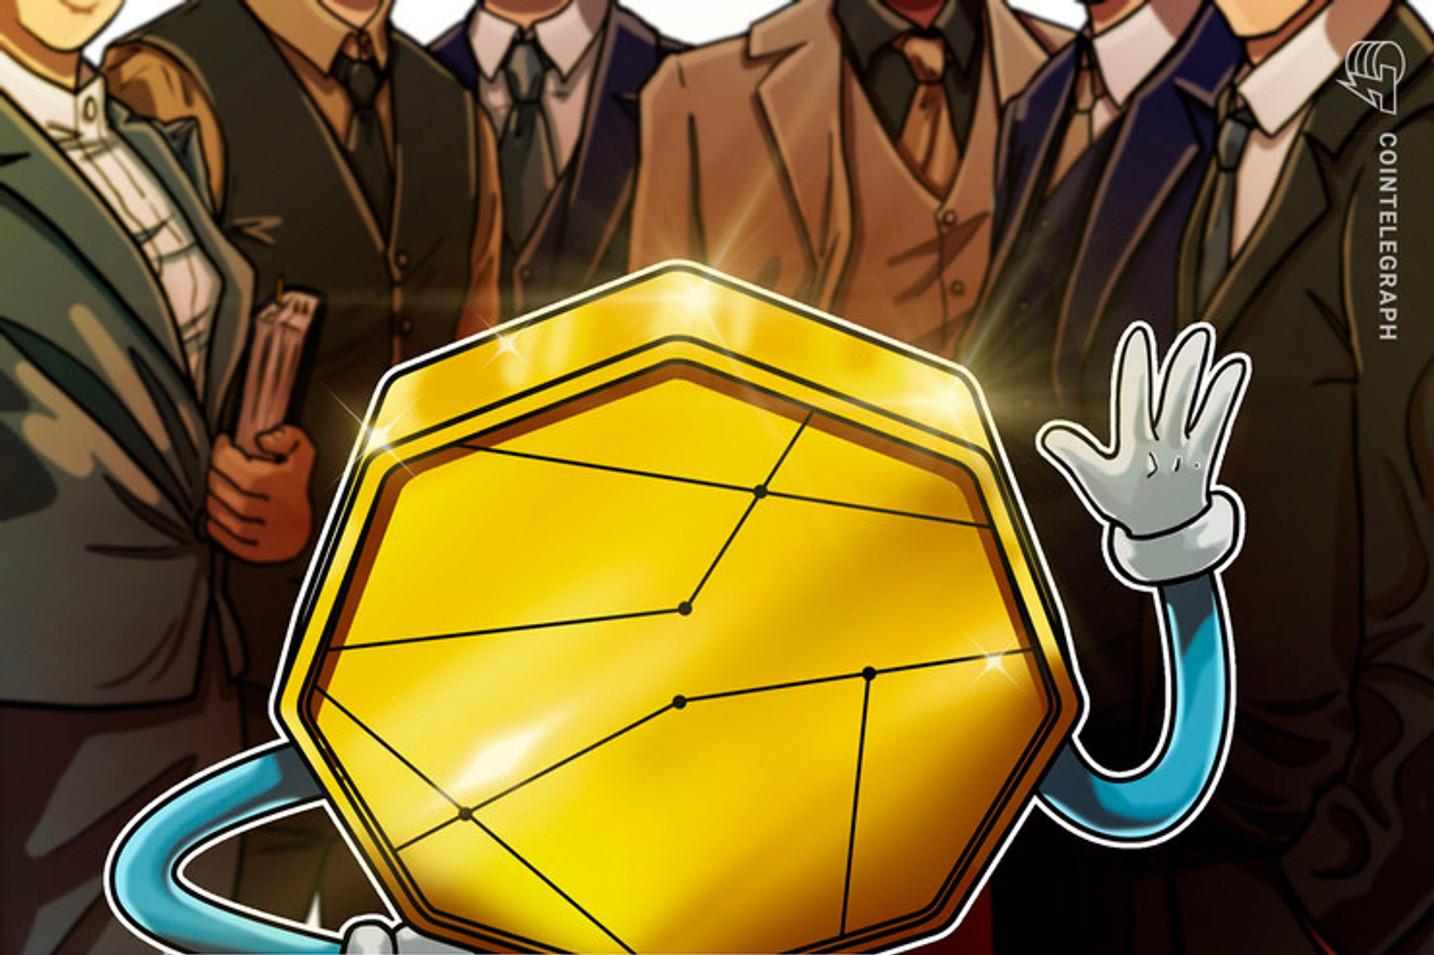 Argentina: ¿Llegó el momento de un peso digital o de usar Bitcoin como alternativa a la moneda nacional?